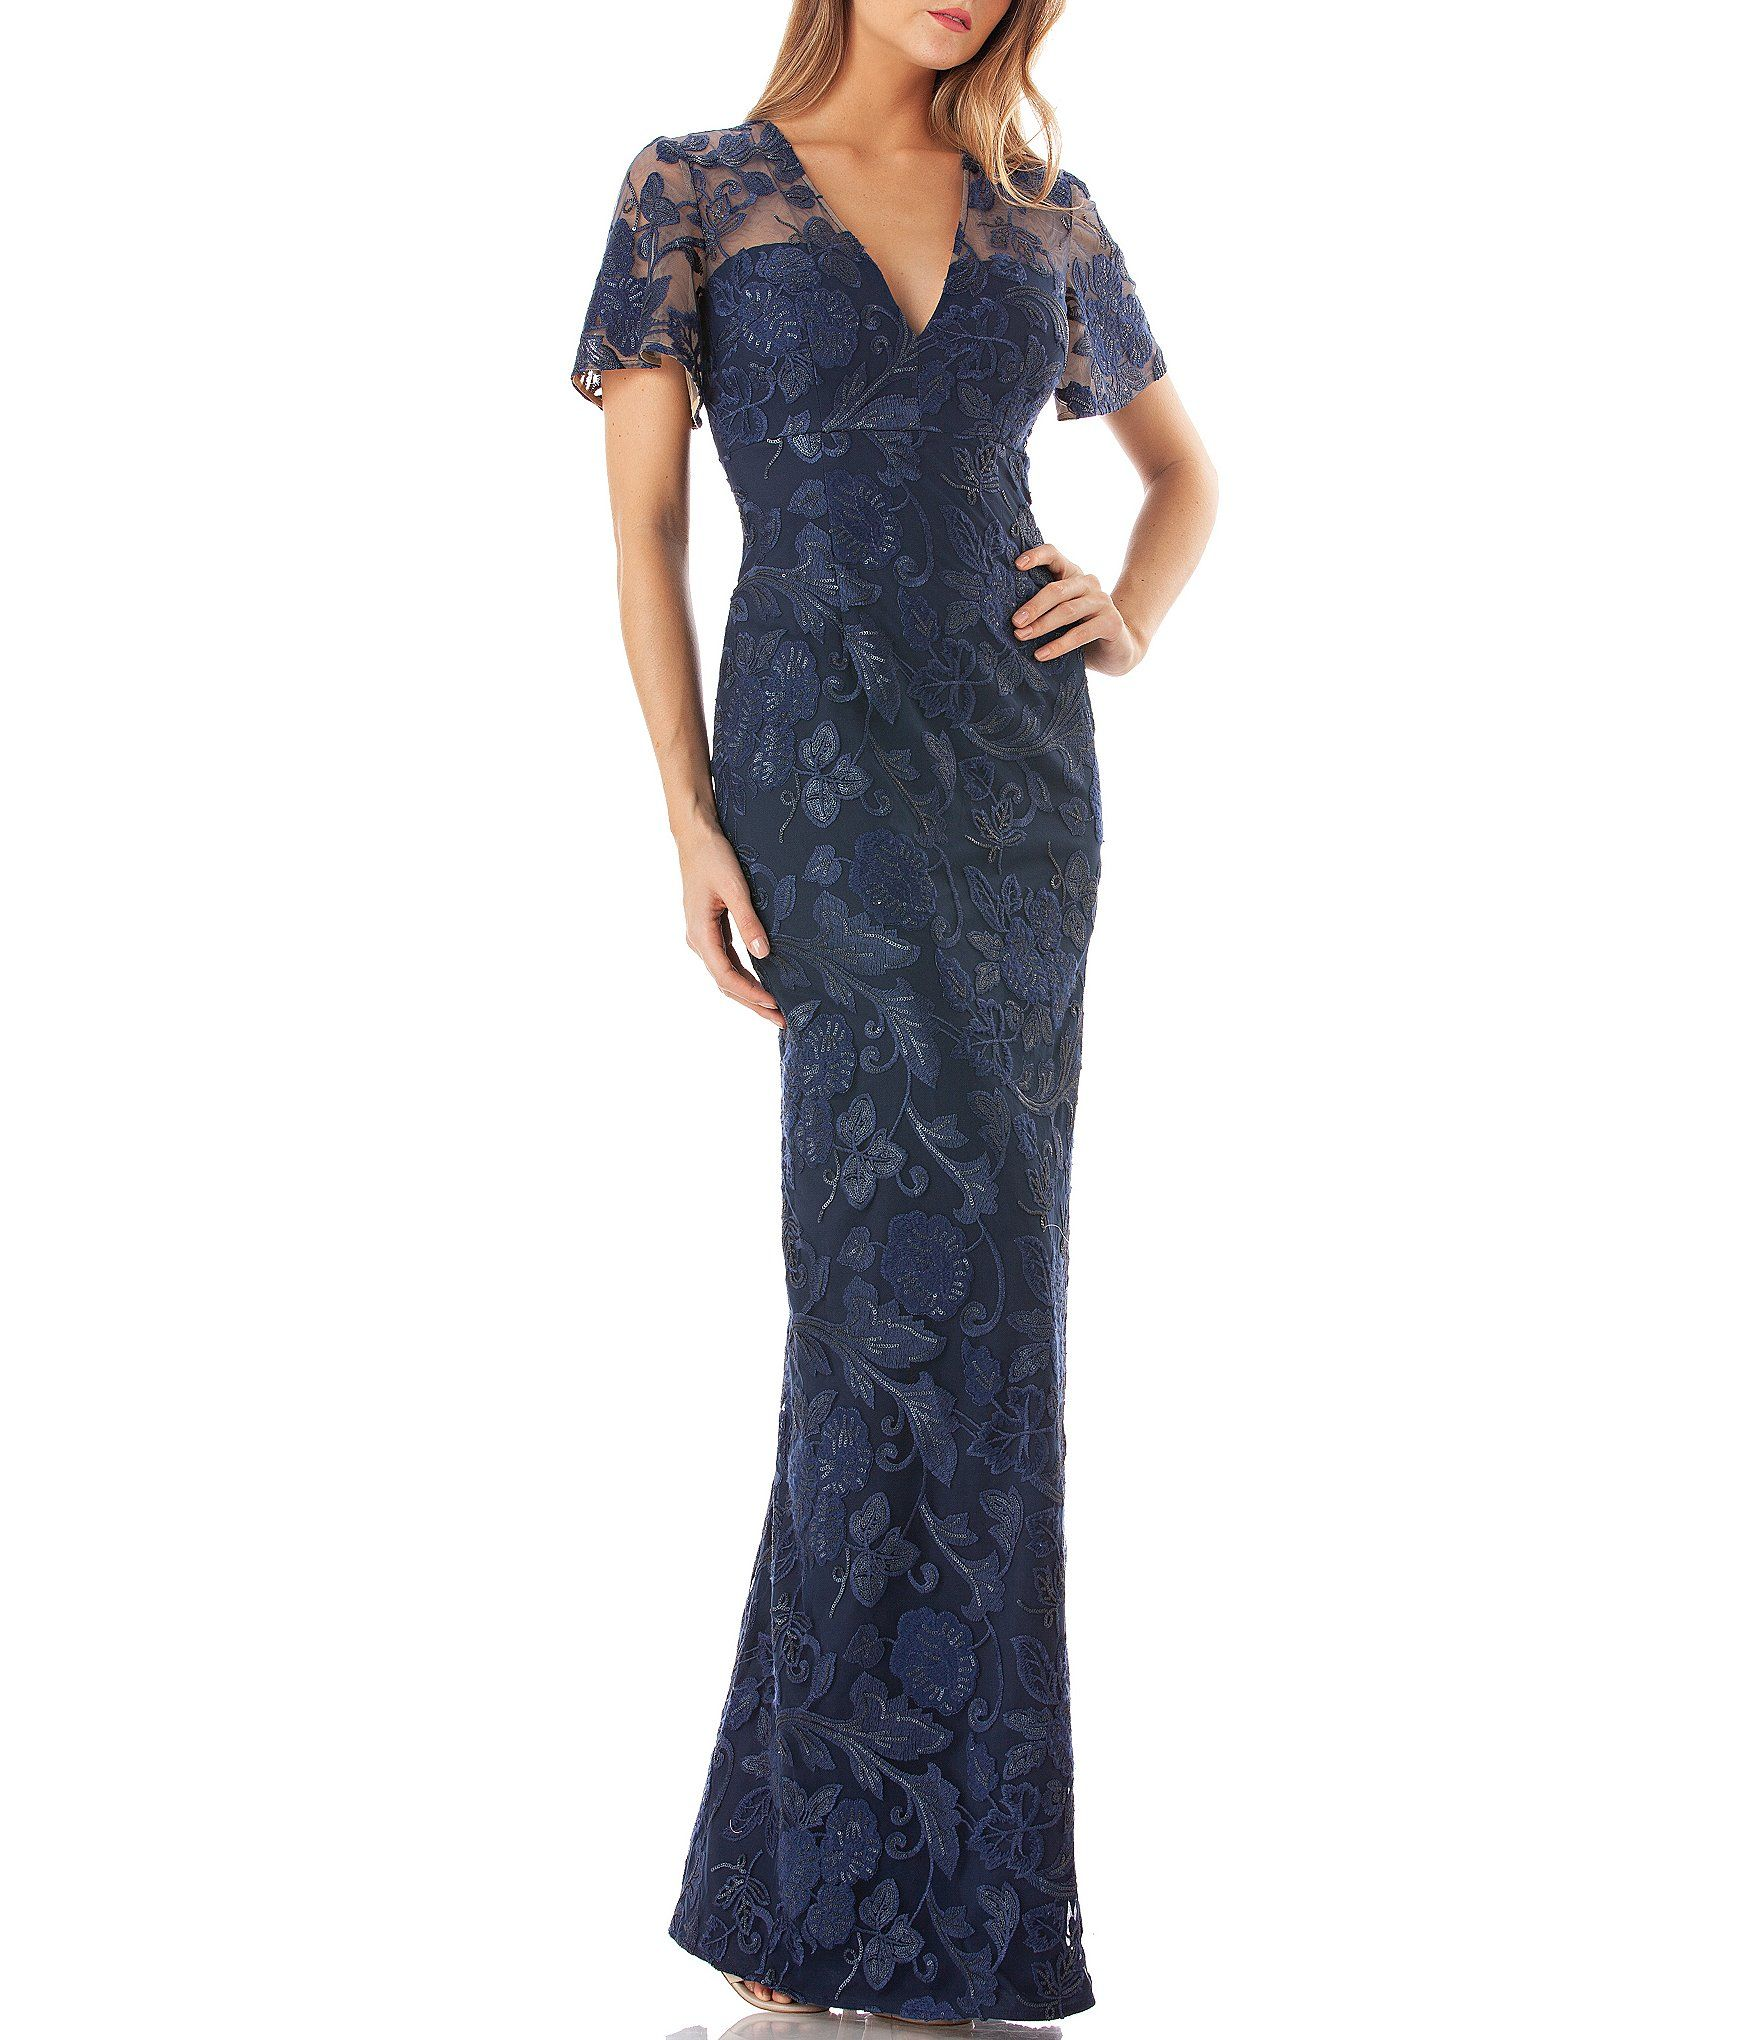 e62f0523f98d Carmen Marc Valvo Embroidered Sequin V-Neck Gown #Dillards   Wedding ...